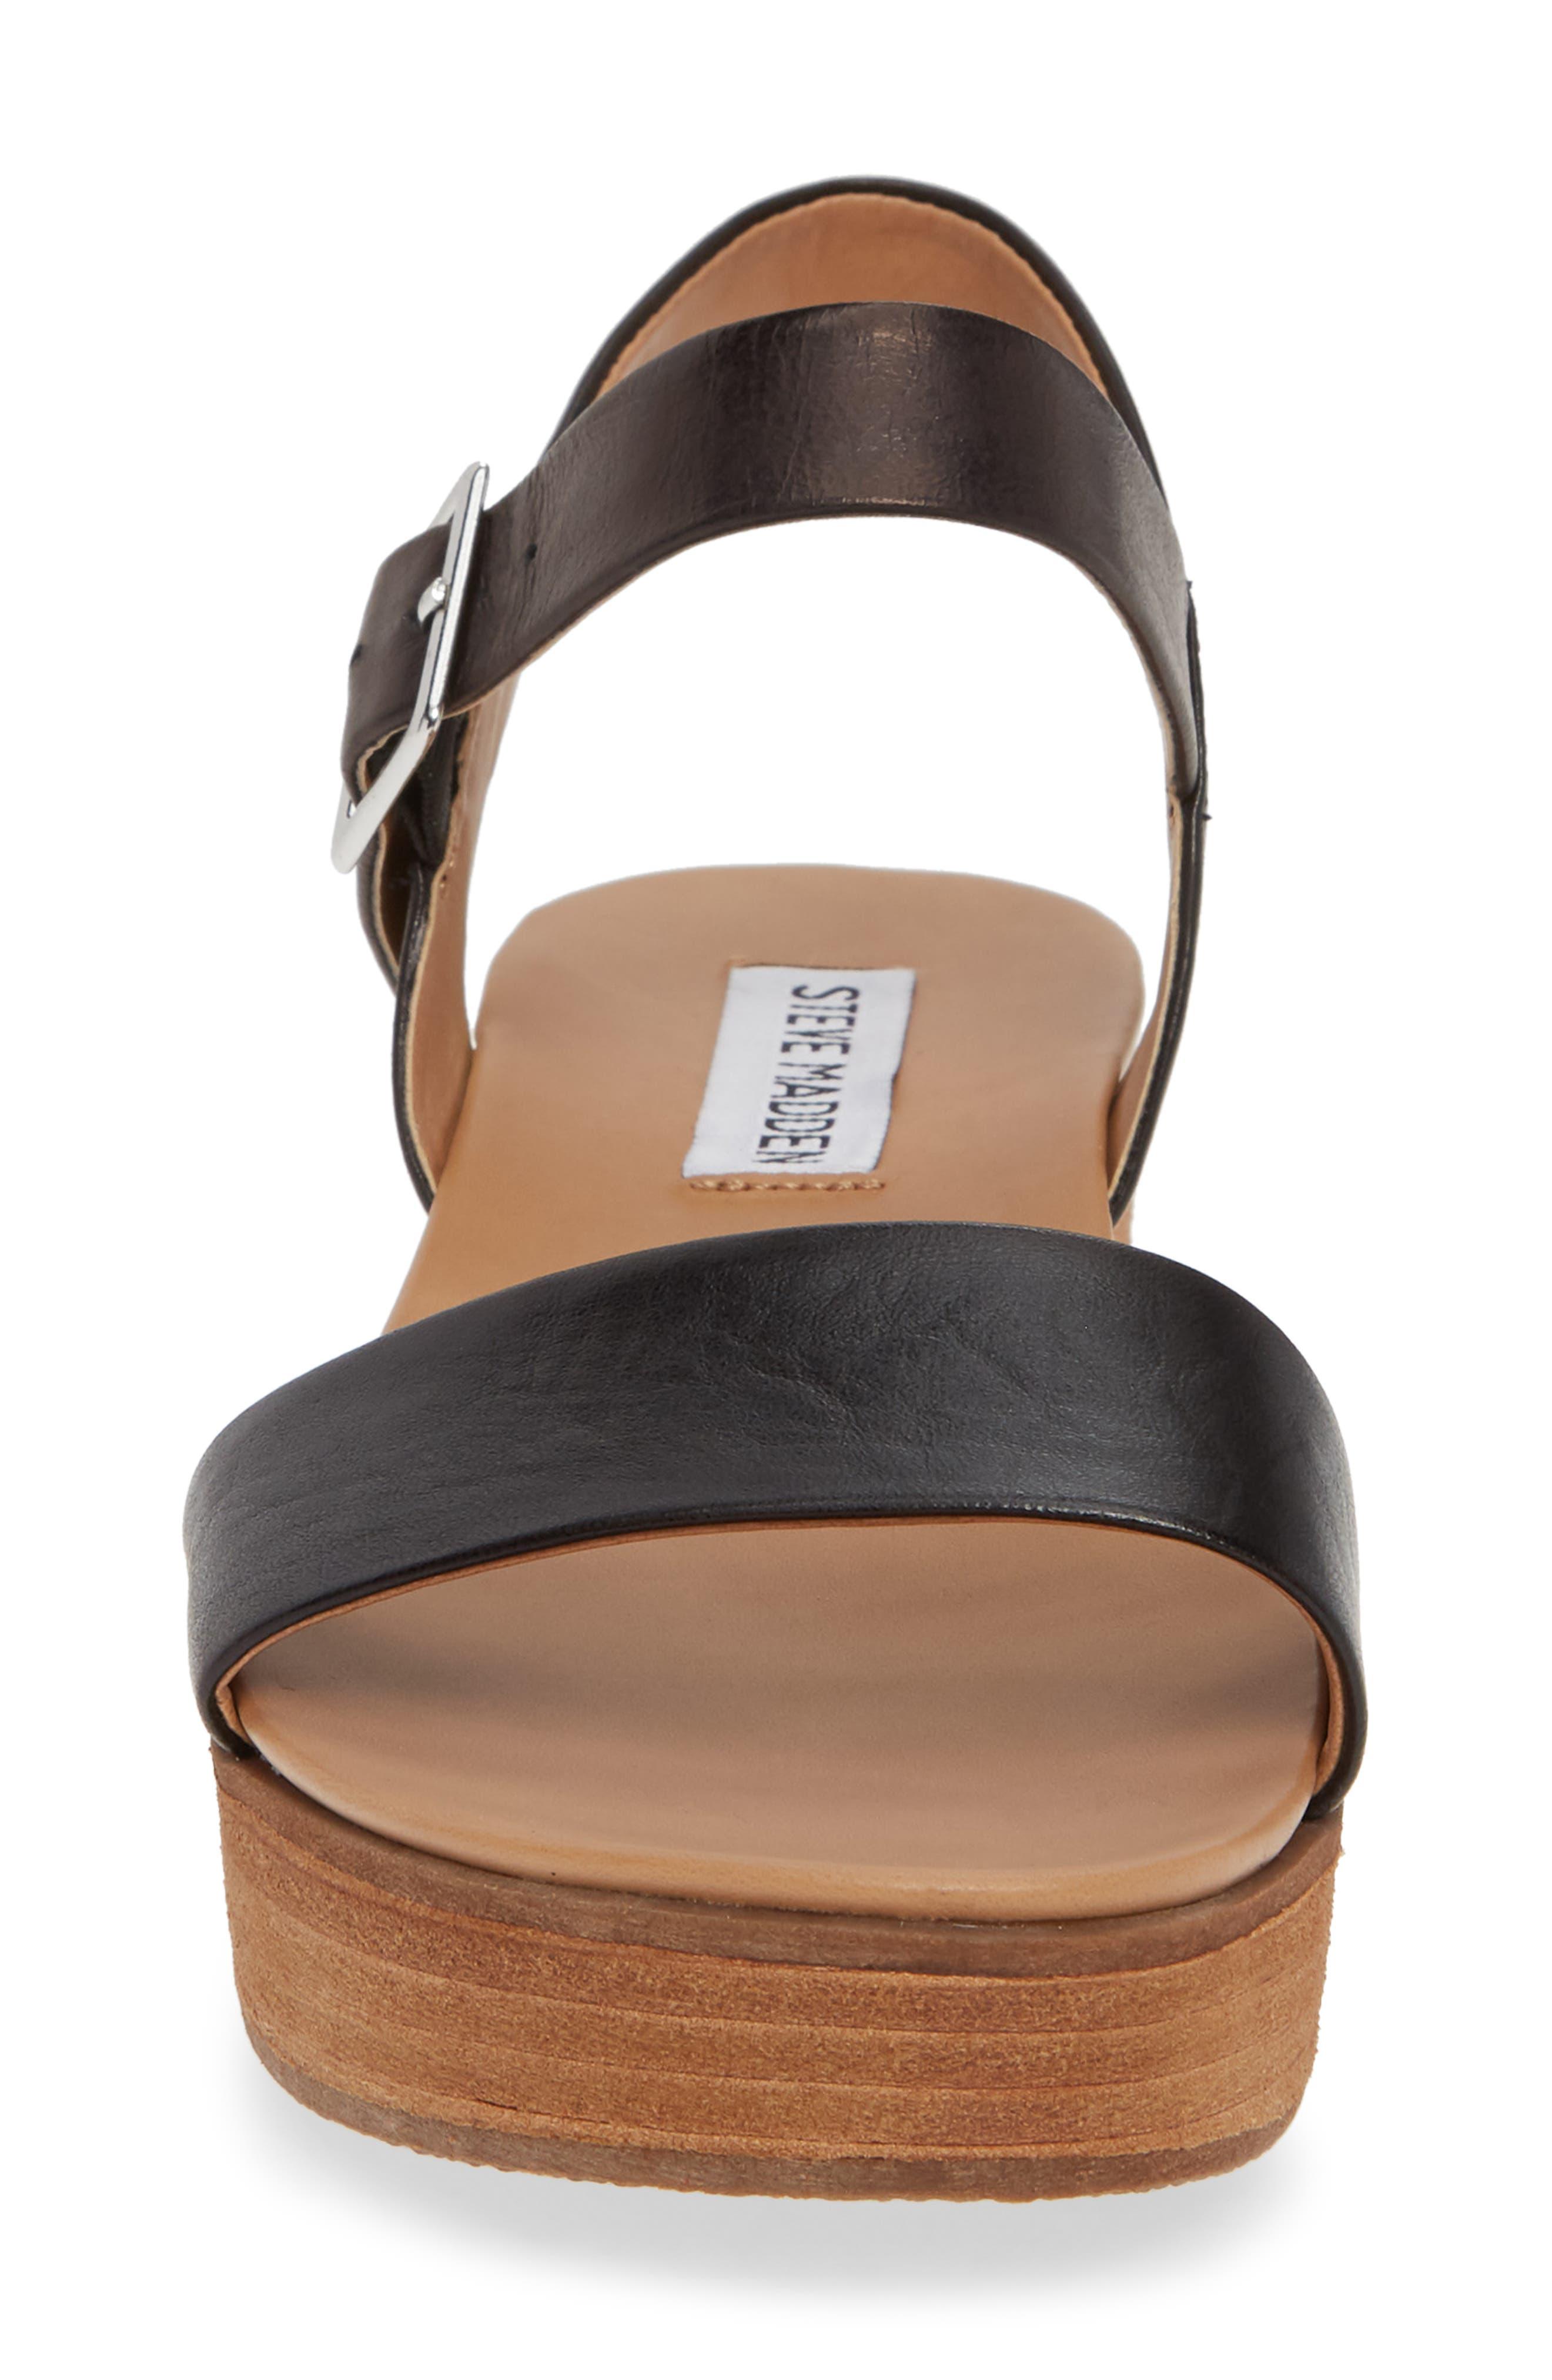 STEVE MADDEN, Aida Platform Sandal, Alternate thumbnail 4, color, BLACK LEATHER